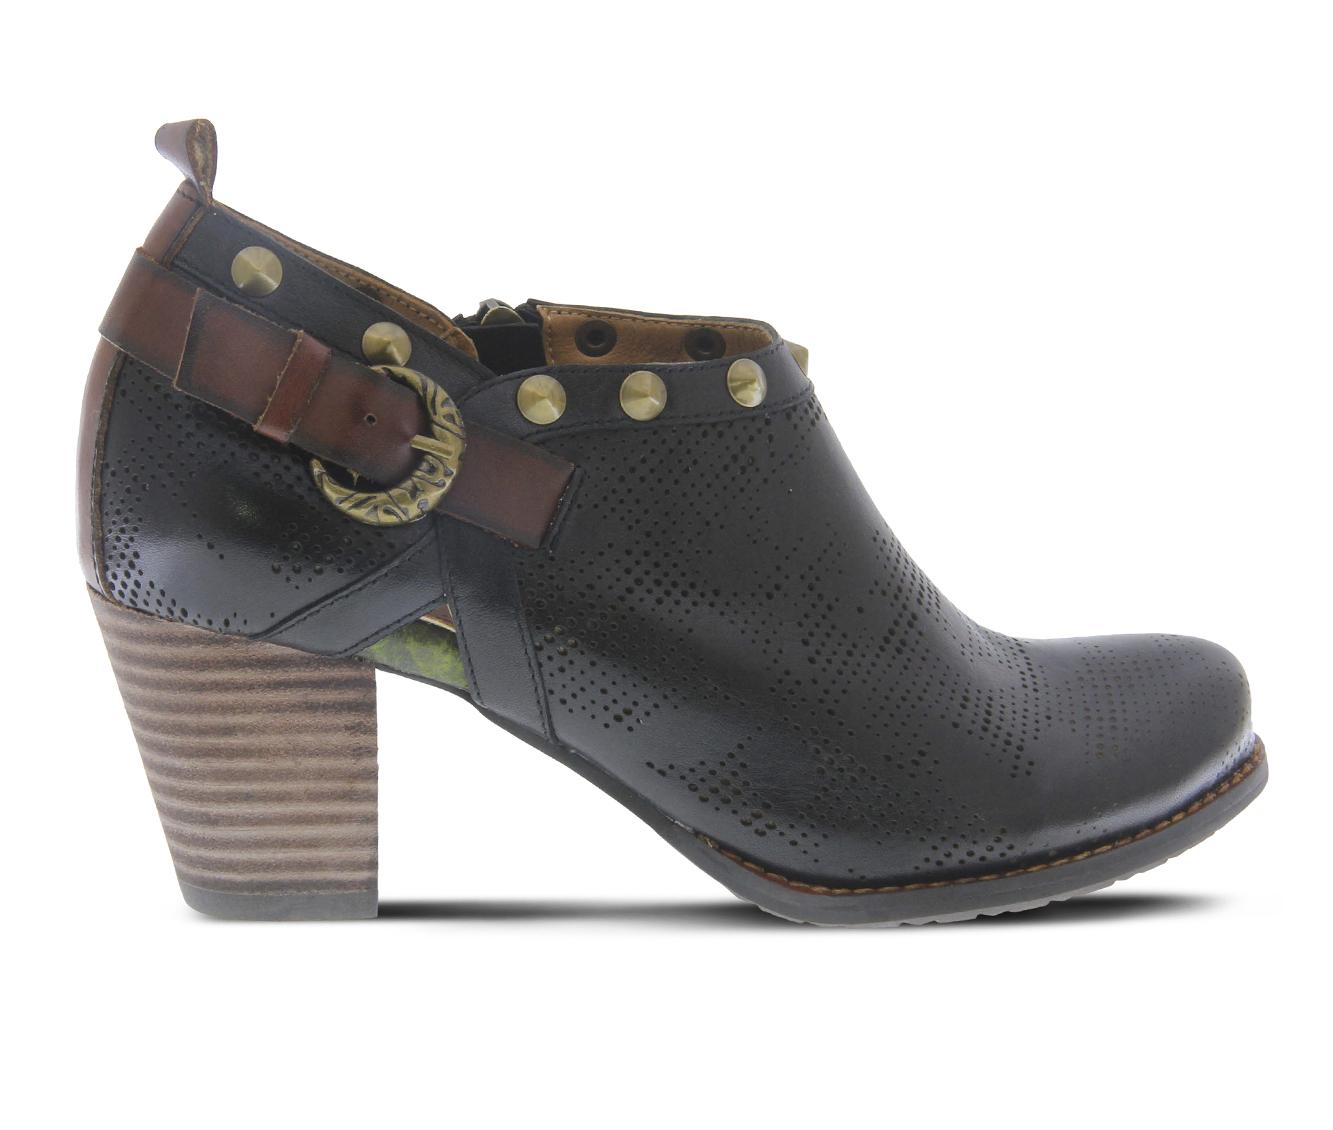 L'Artiste Kacie Women's Dress Shoe (Black Leather)